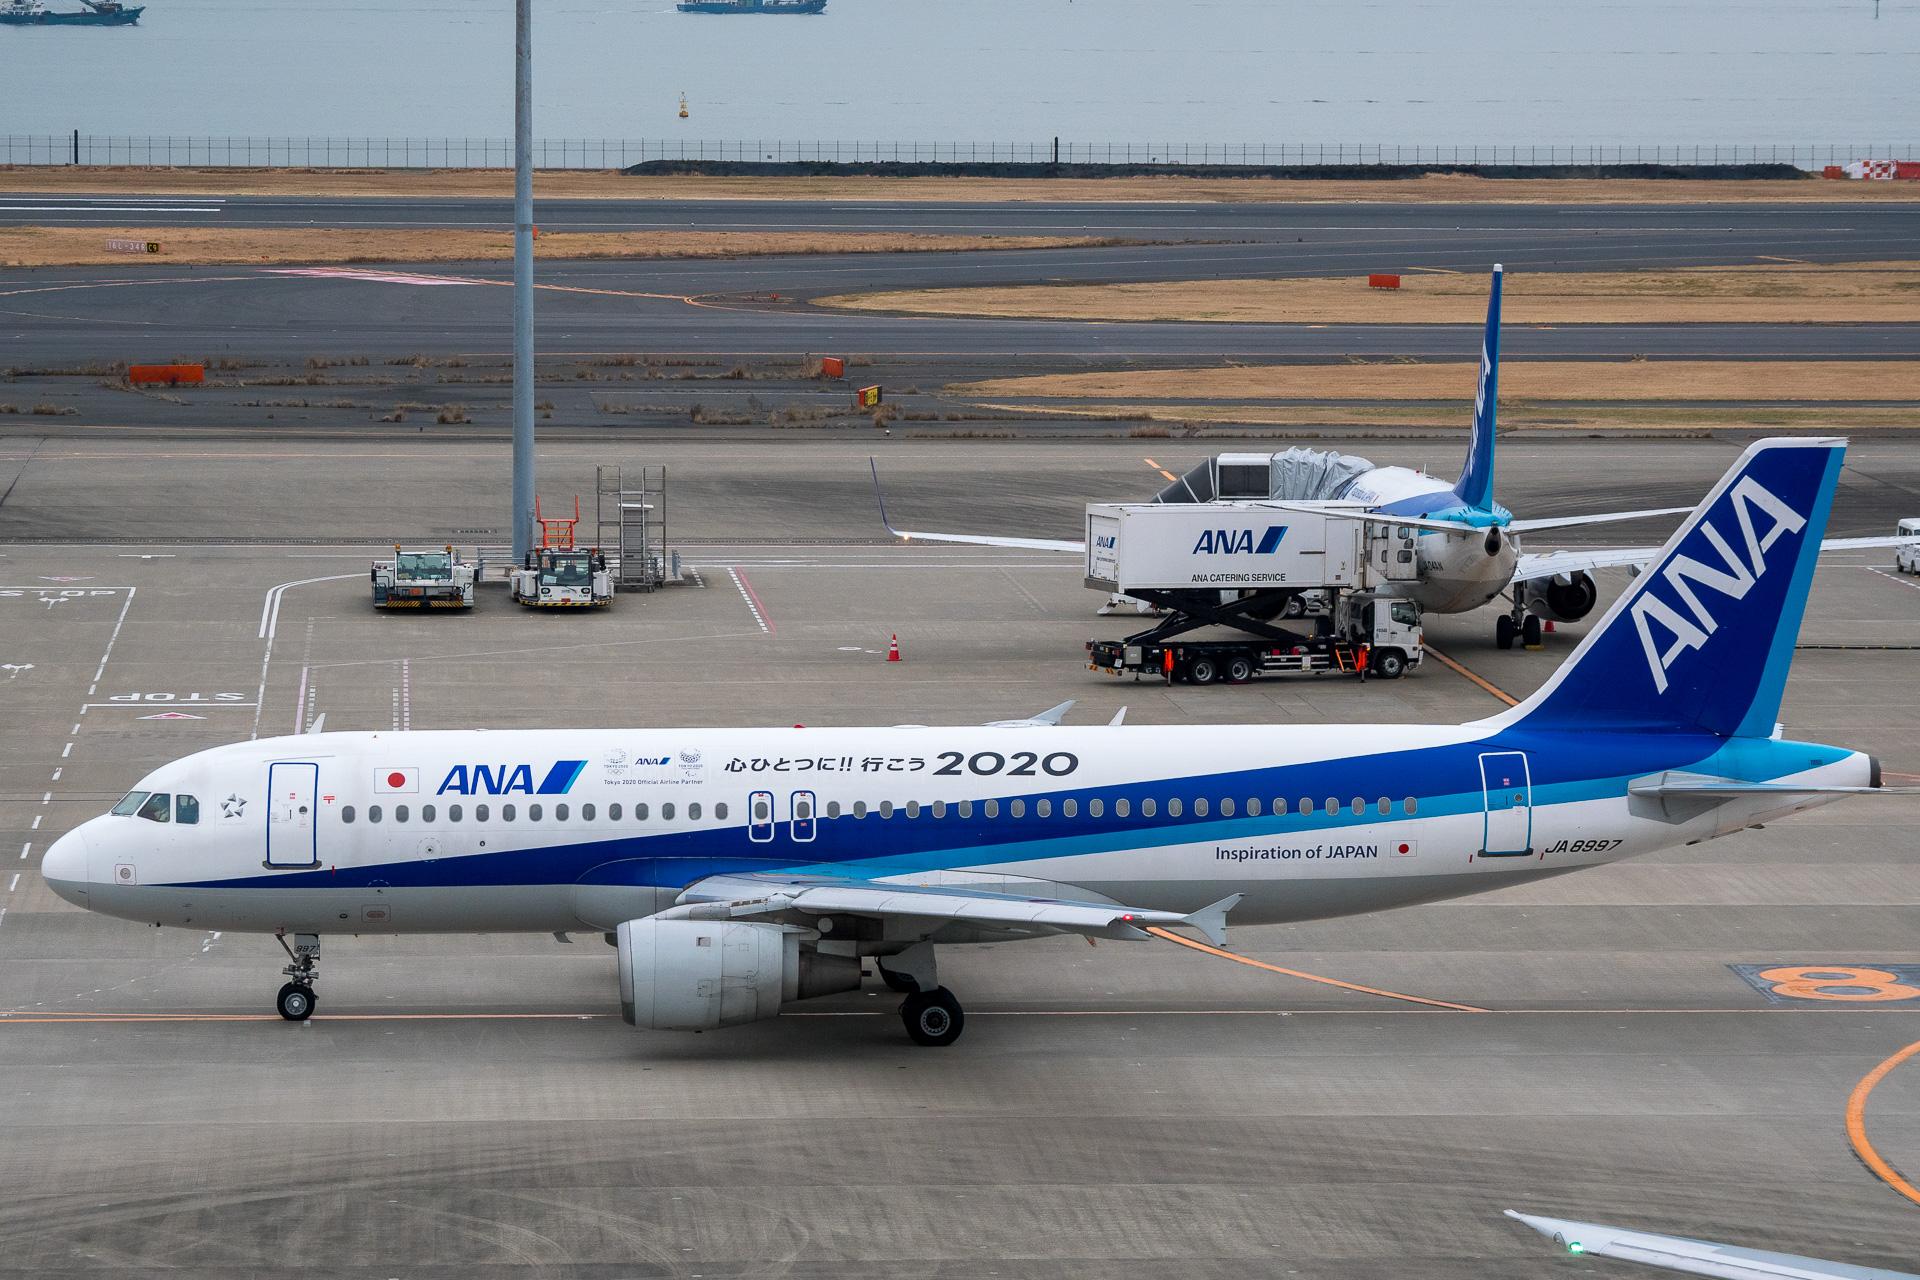 ANA仕様の国内線向けエアバス A320ceo型機が全機退役。2月29日の羽田 ...